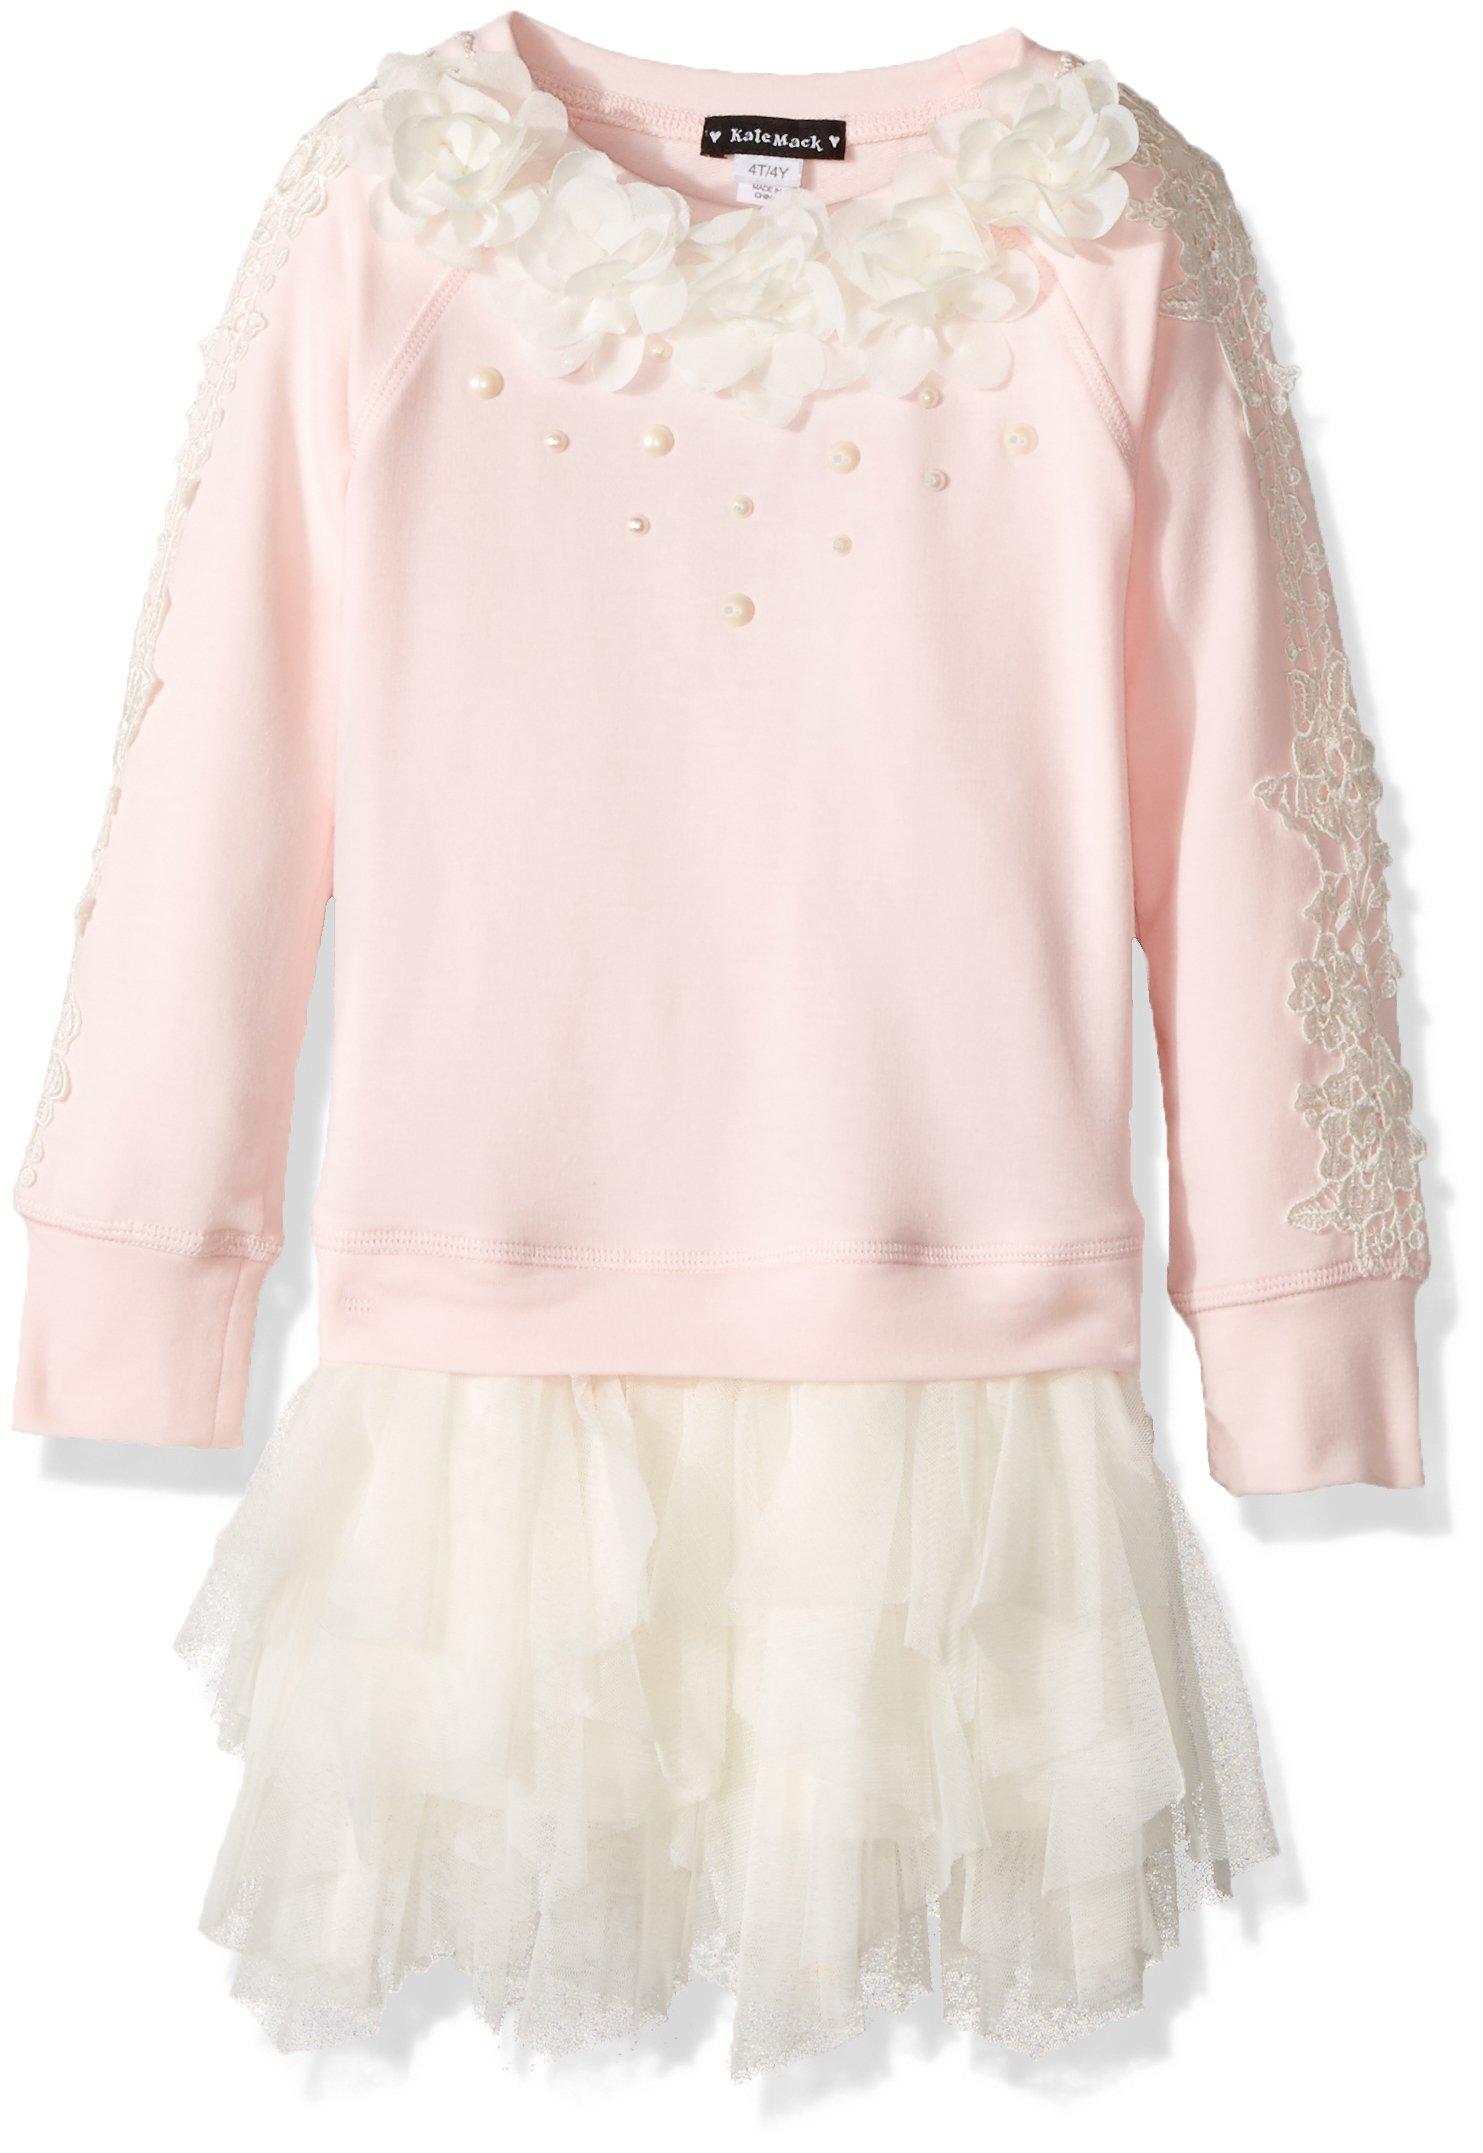 Kate Mack Girls' Toddler Gateau Rose Sweatshirt Knit Dress with Netting Skirt, Pink 2T